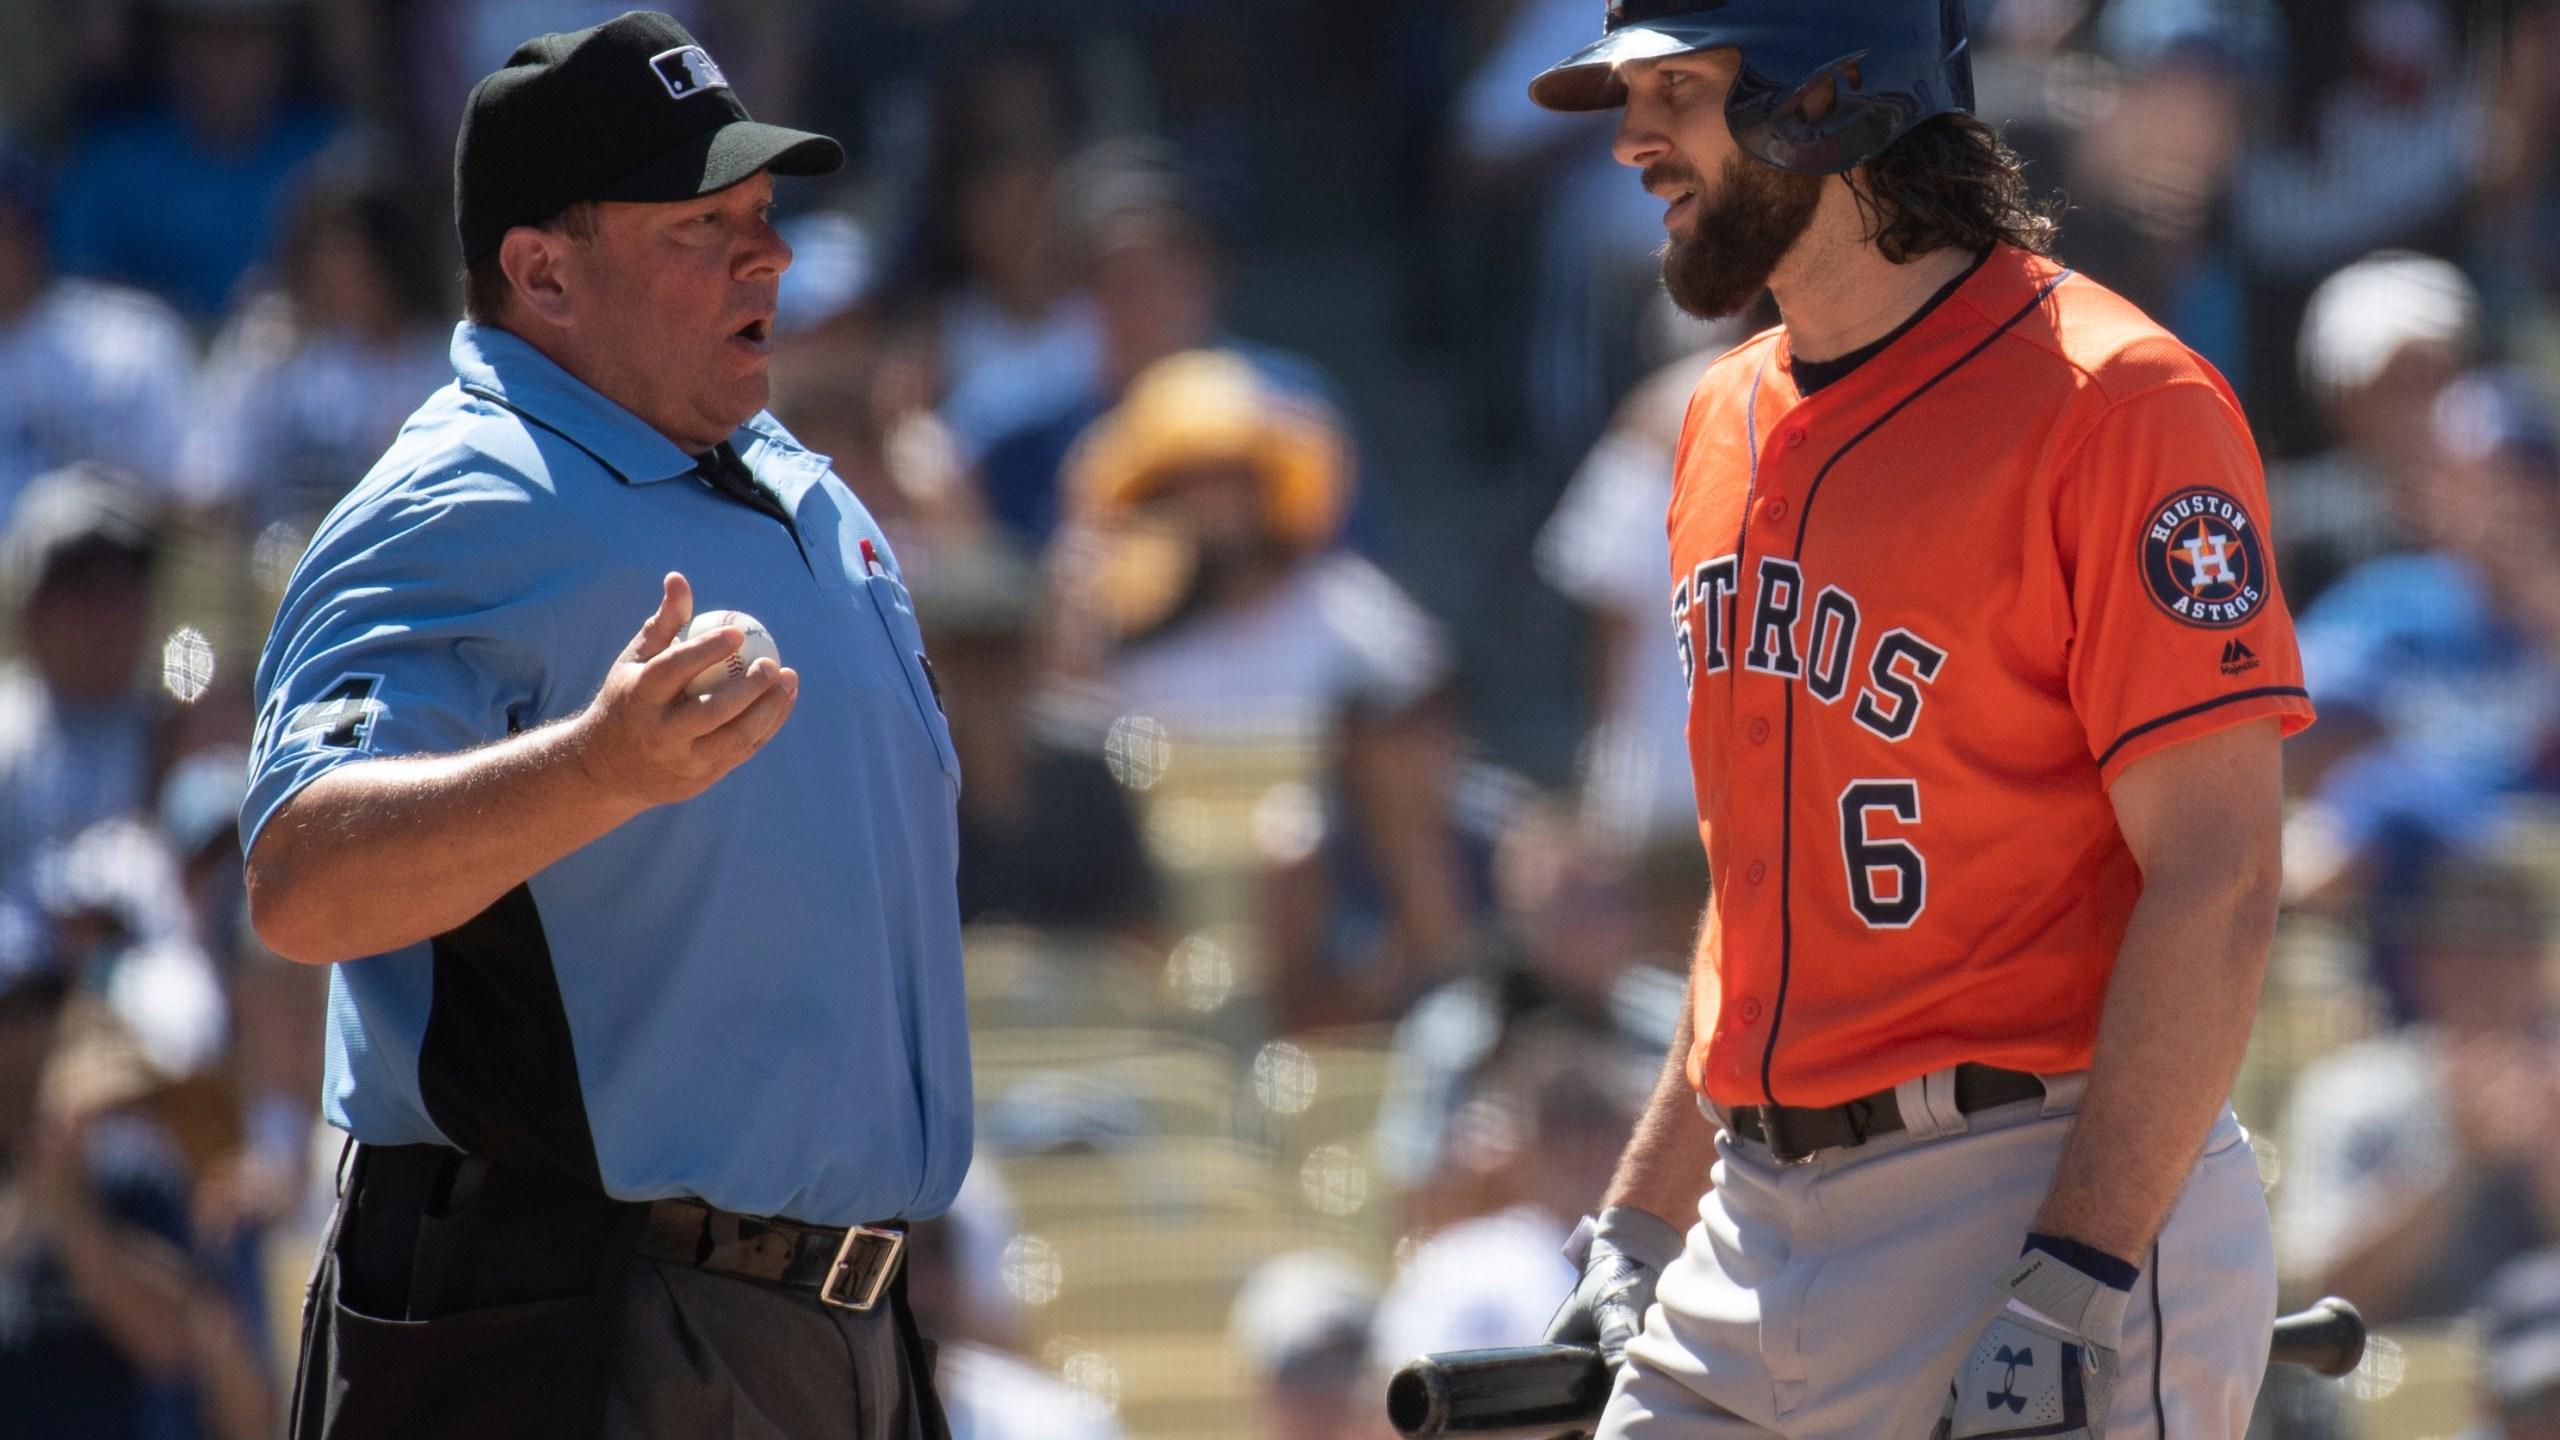 Astros Dodgers Baseball_1533519133586